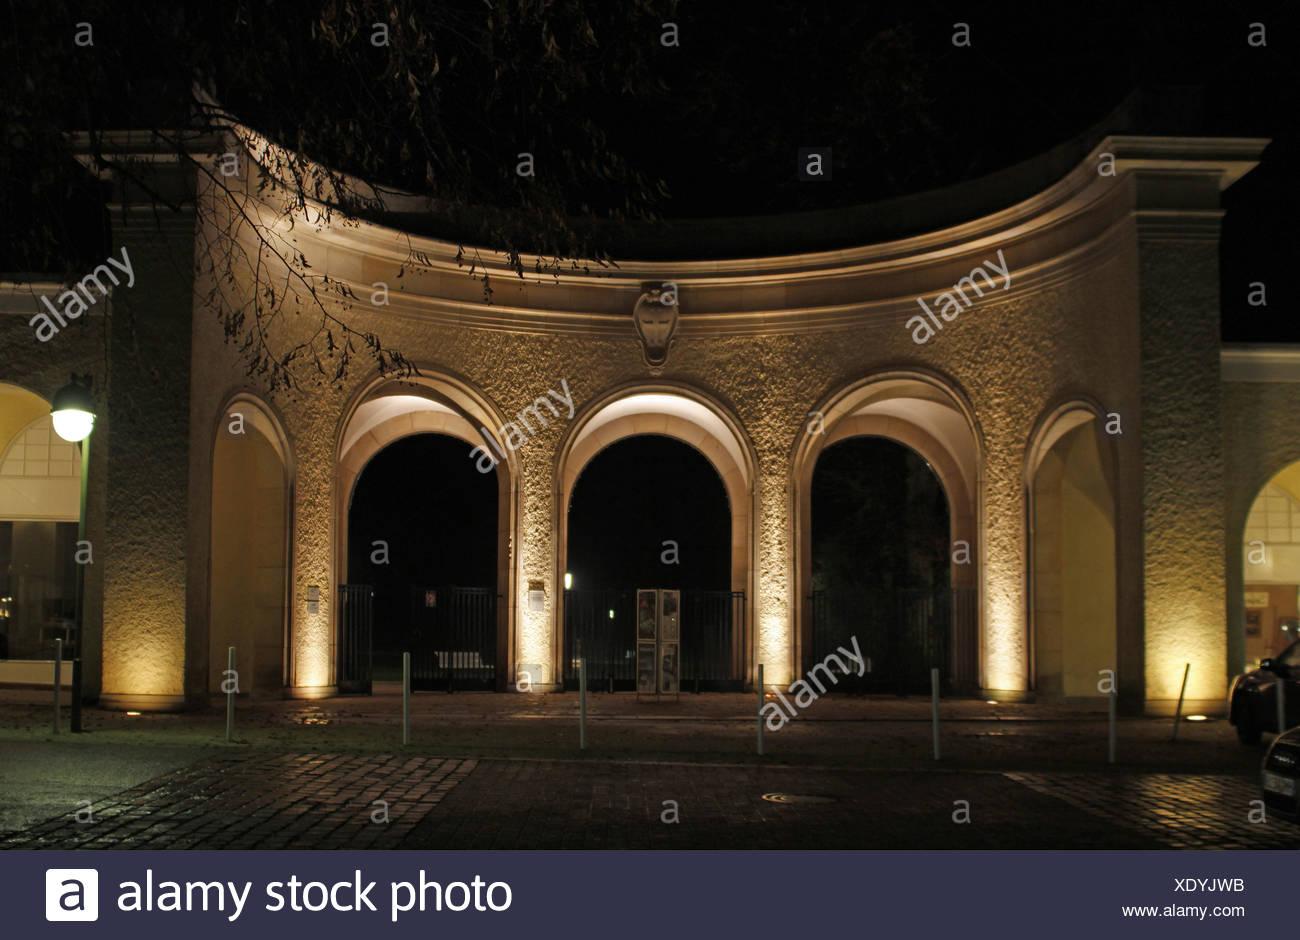 park, goal, passage, gate, archgway, gantry, spa gardens, main-entrance, park, Stock Photo